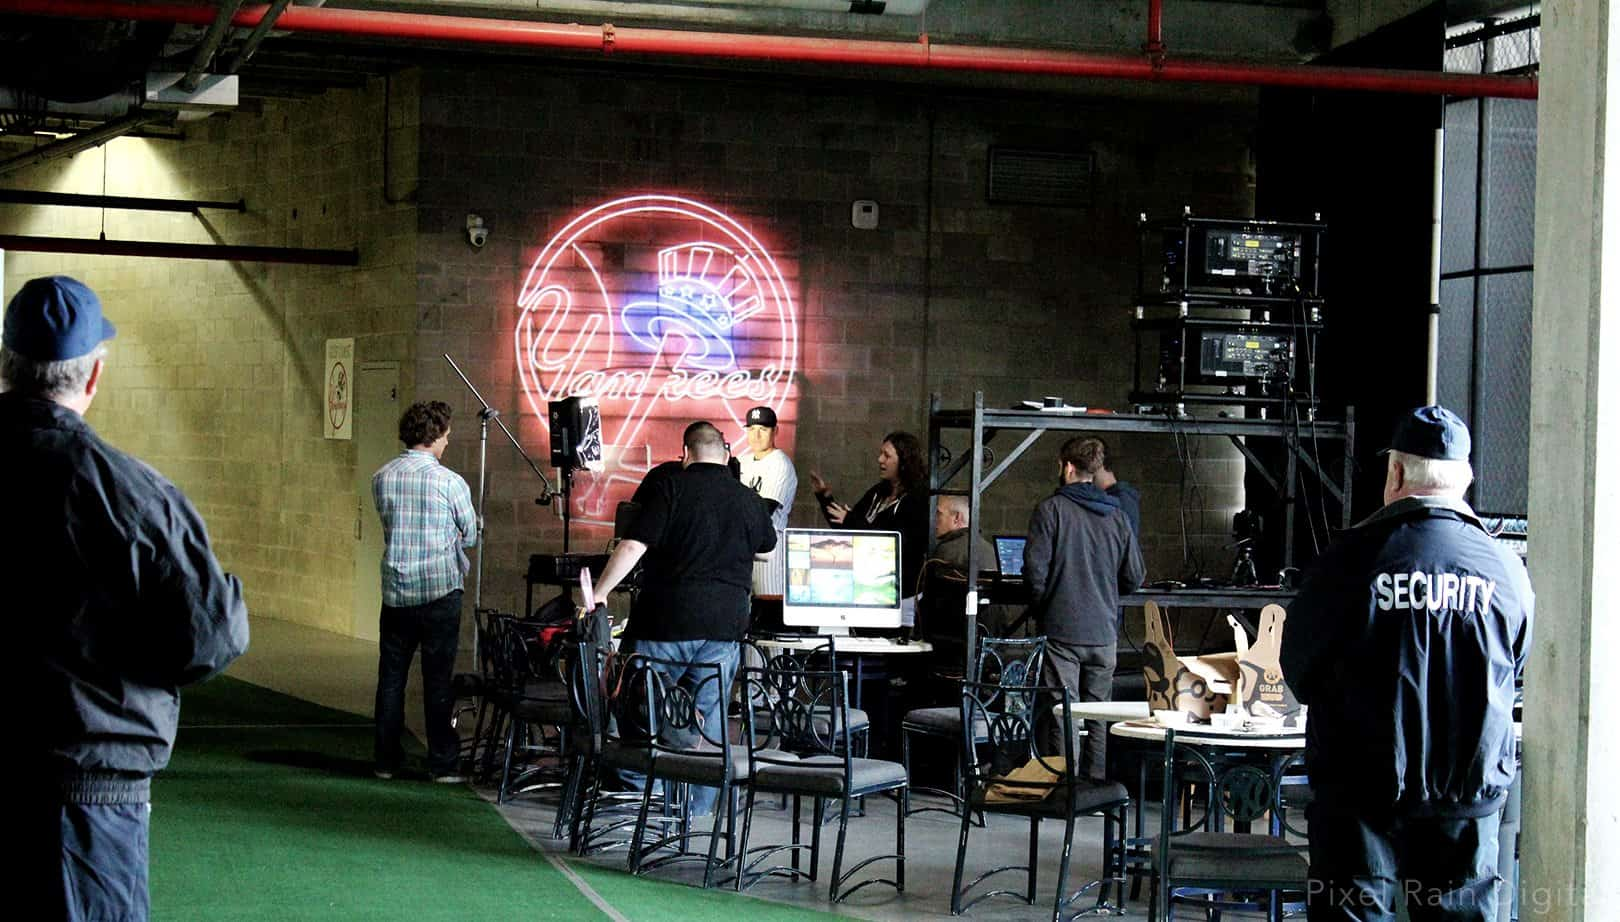 projection mapping new york yankees media day 2015 pixel rain digital tampa florida